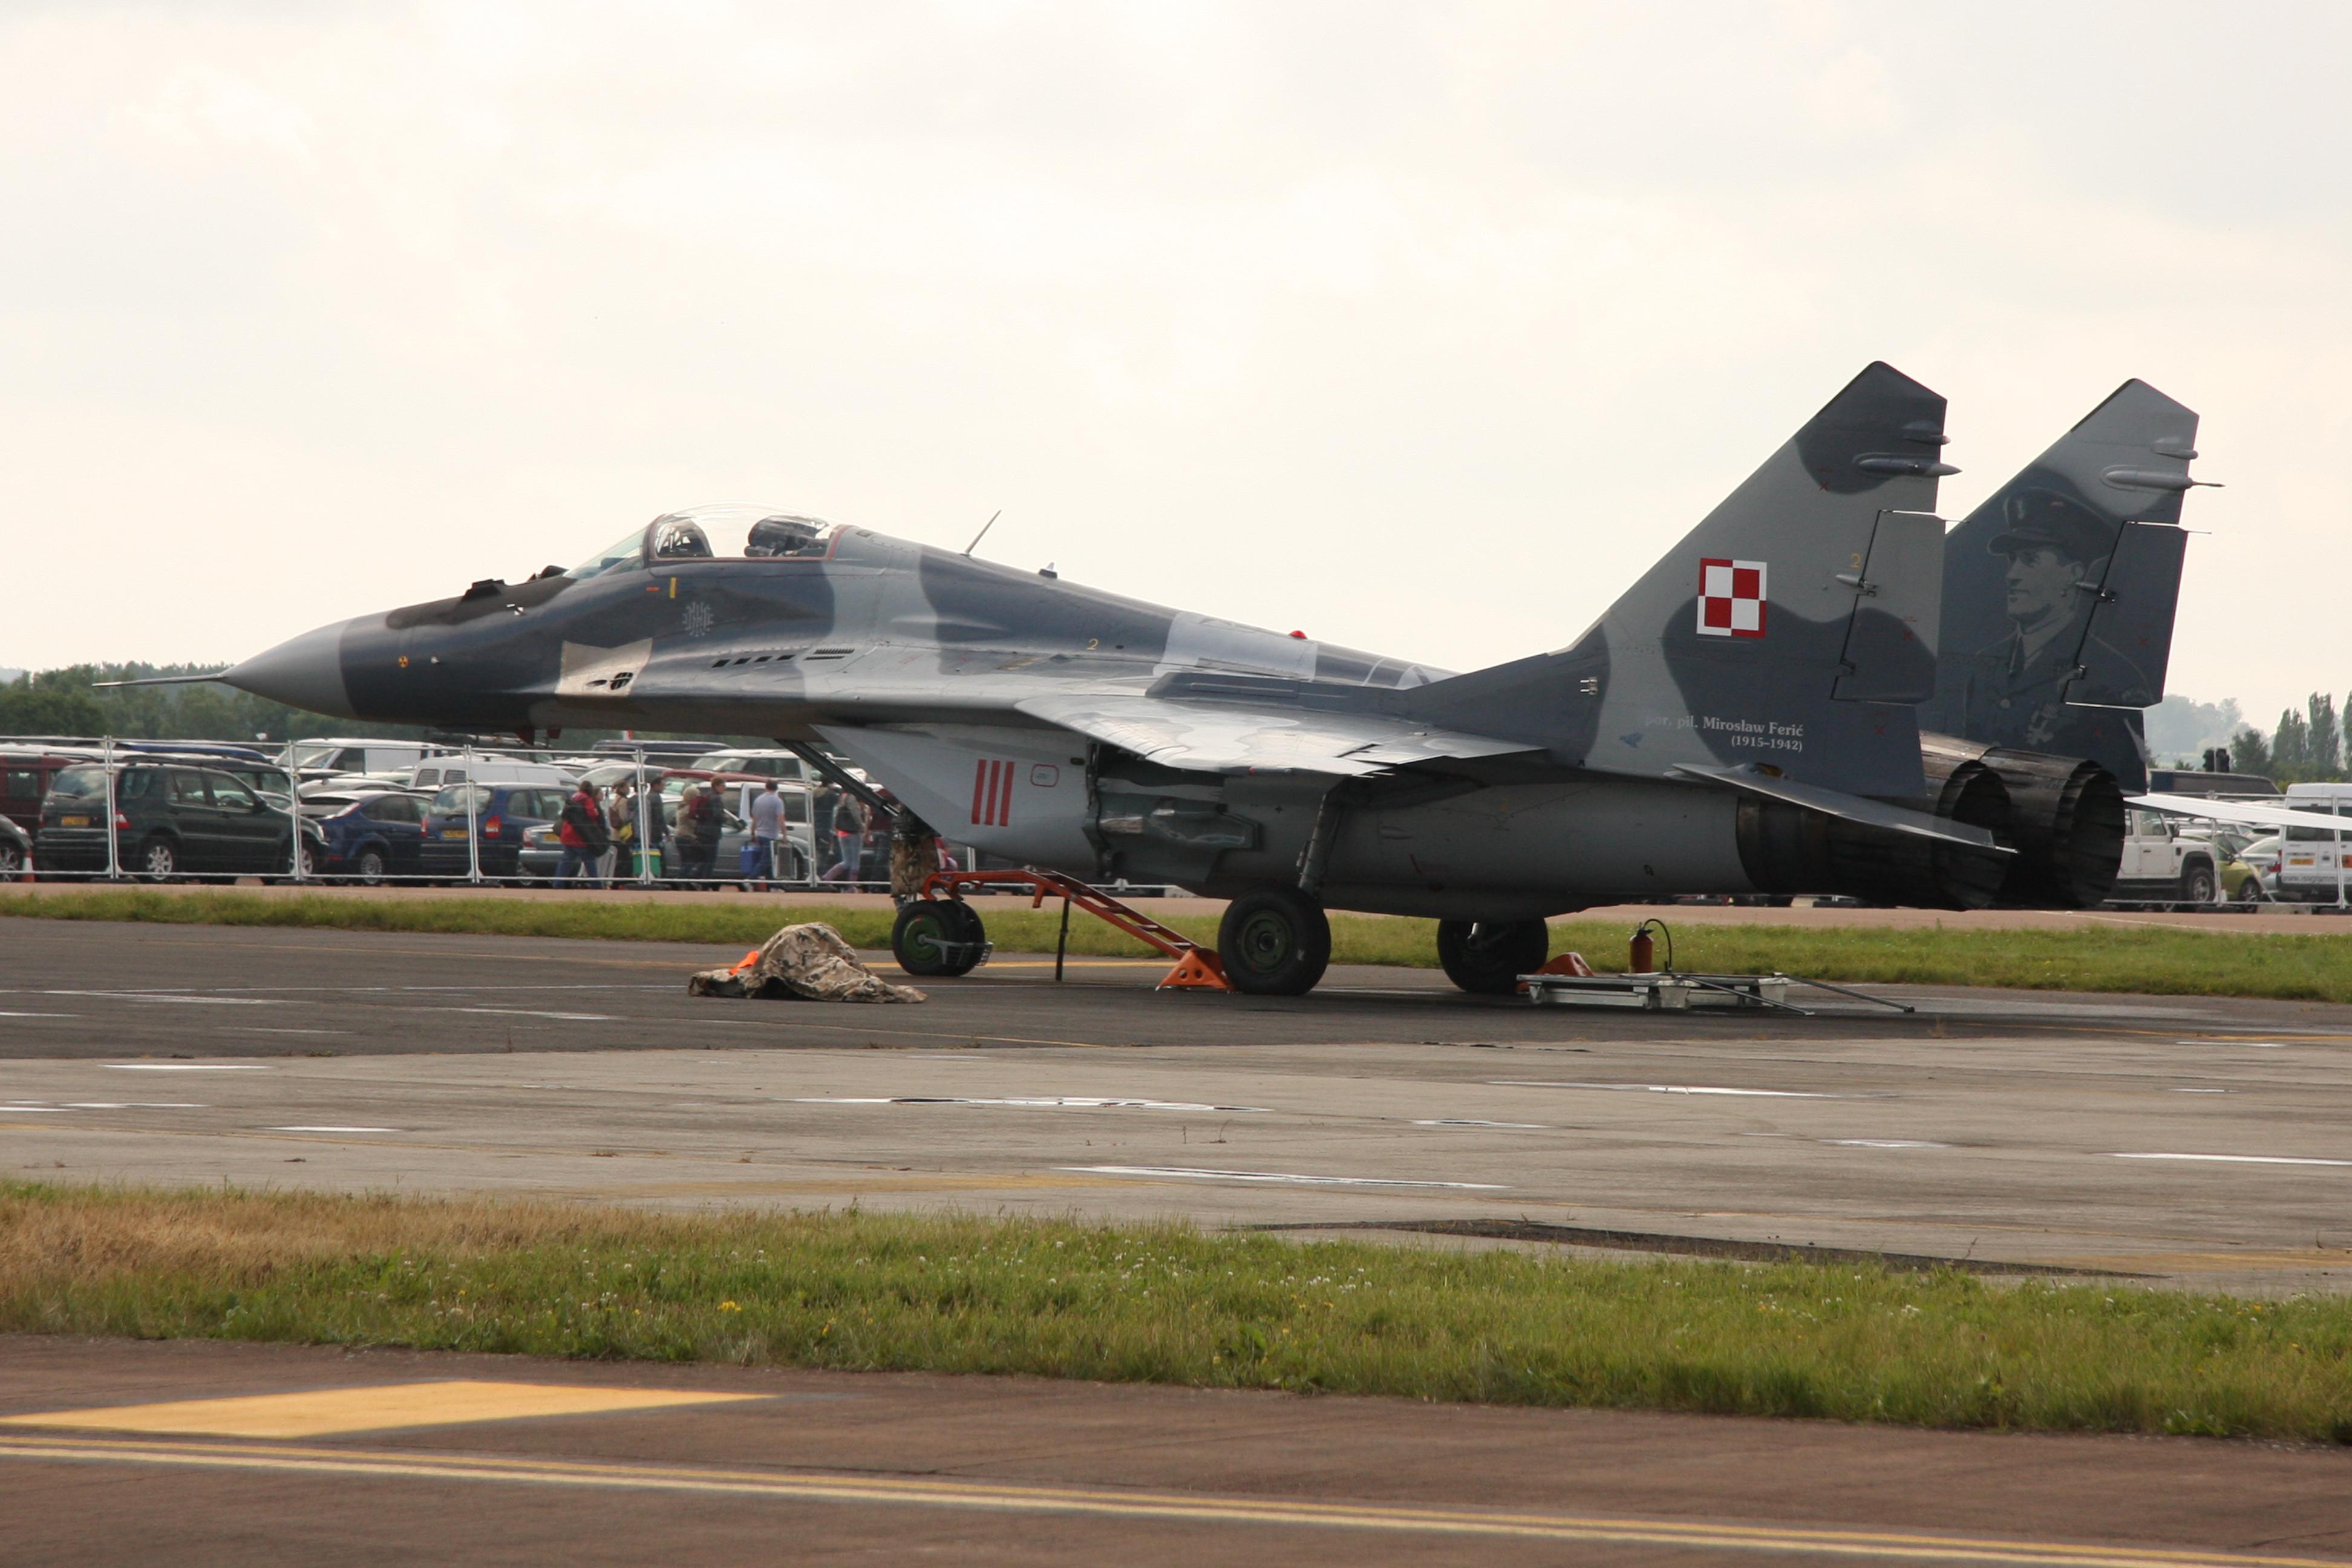 Mikoyan_MiG-29A_Fulcrum_17.jpg